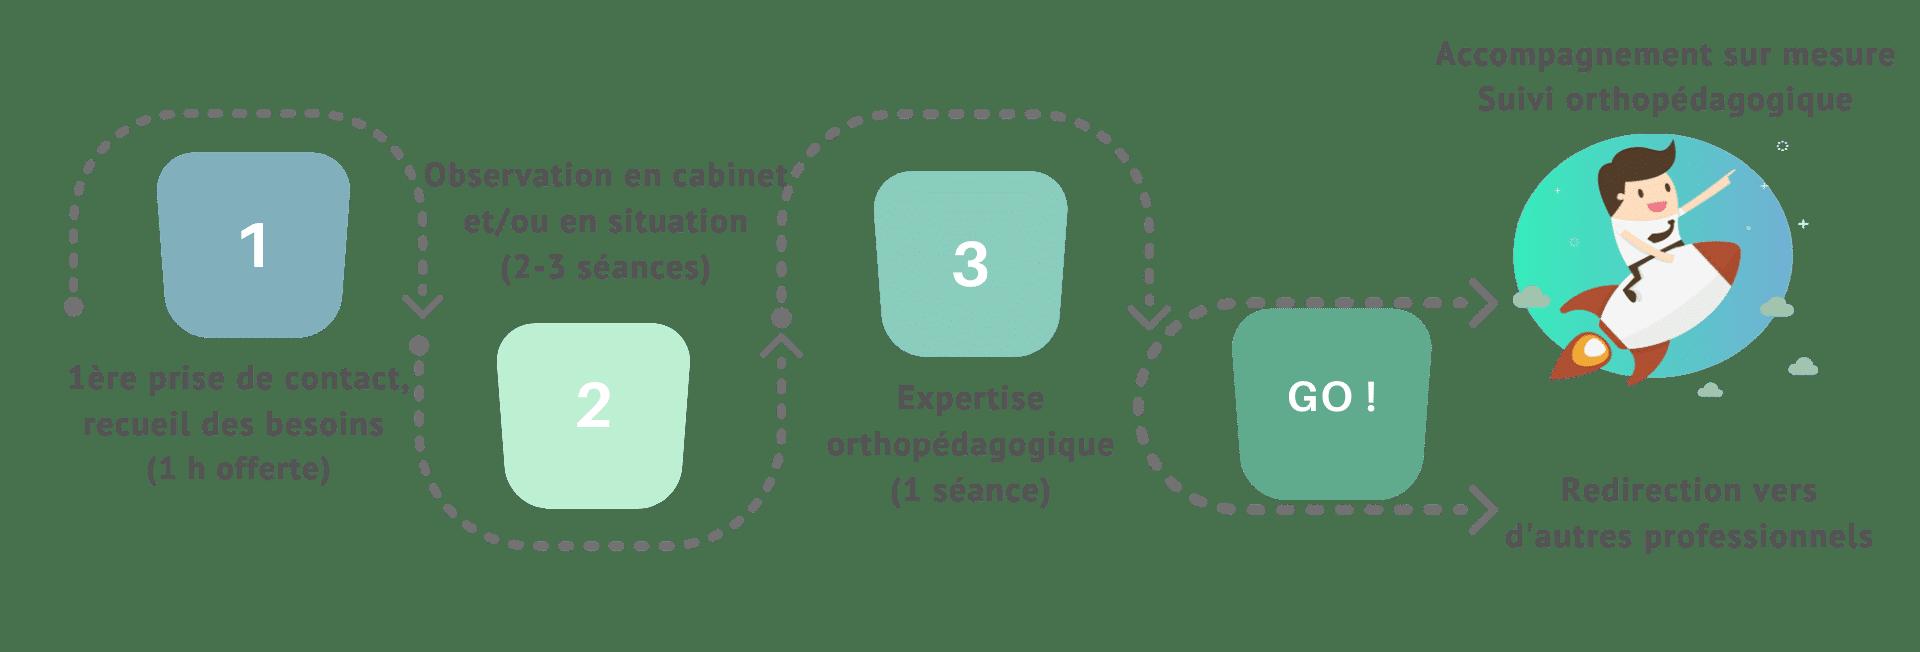 Phase d accompagnement orthopédagogue